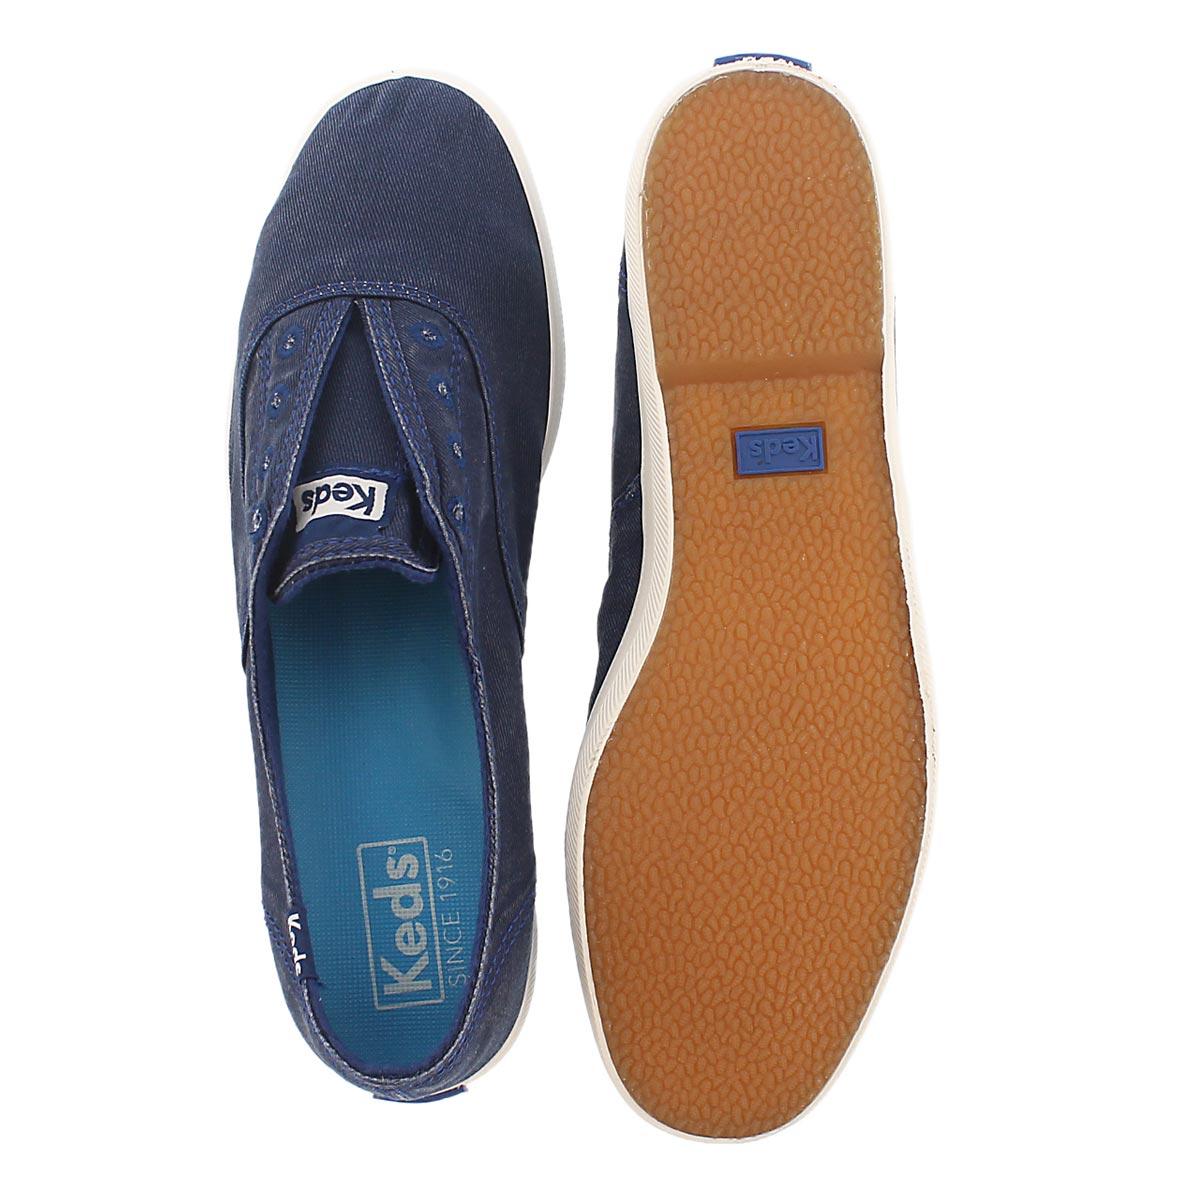 Lds Chillax navy fashion sneaker